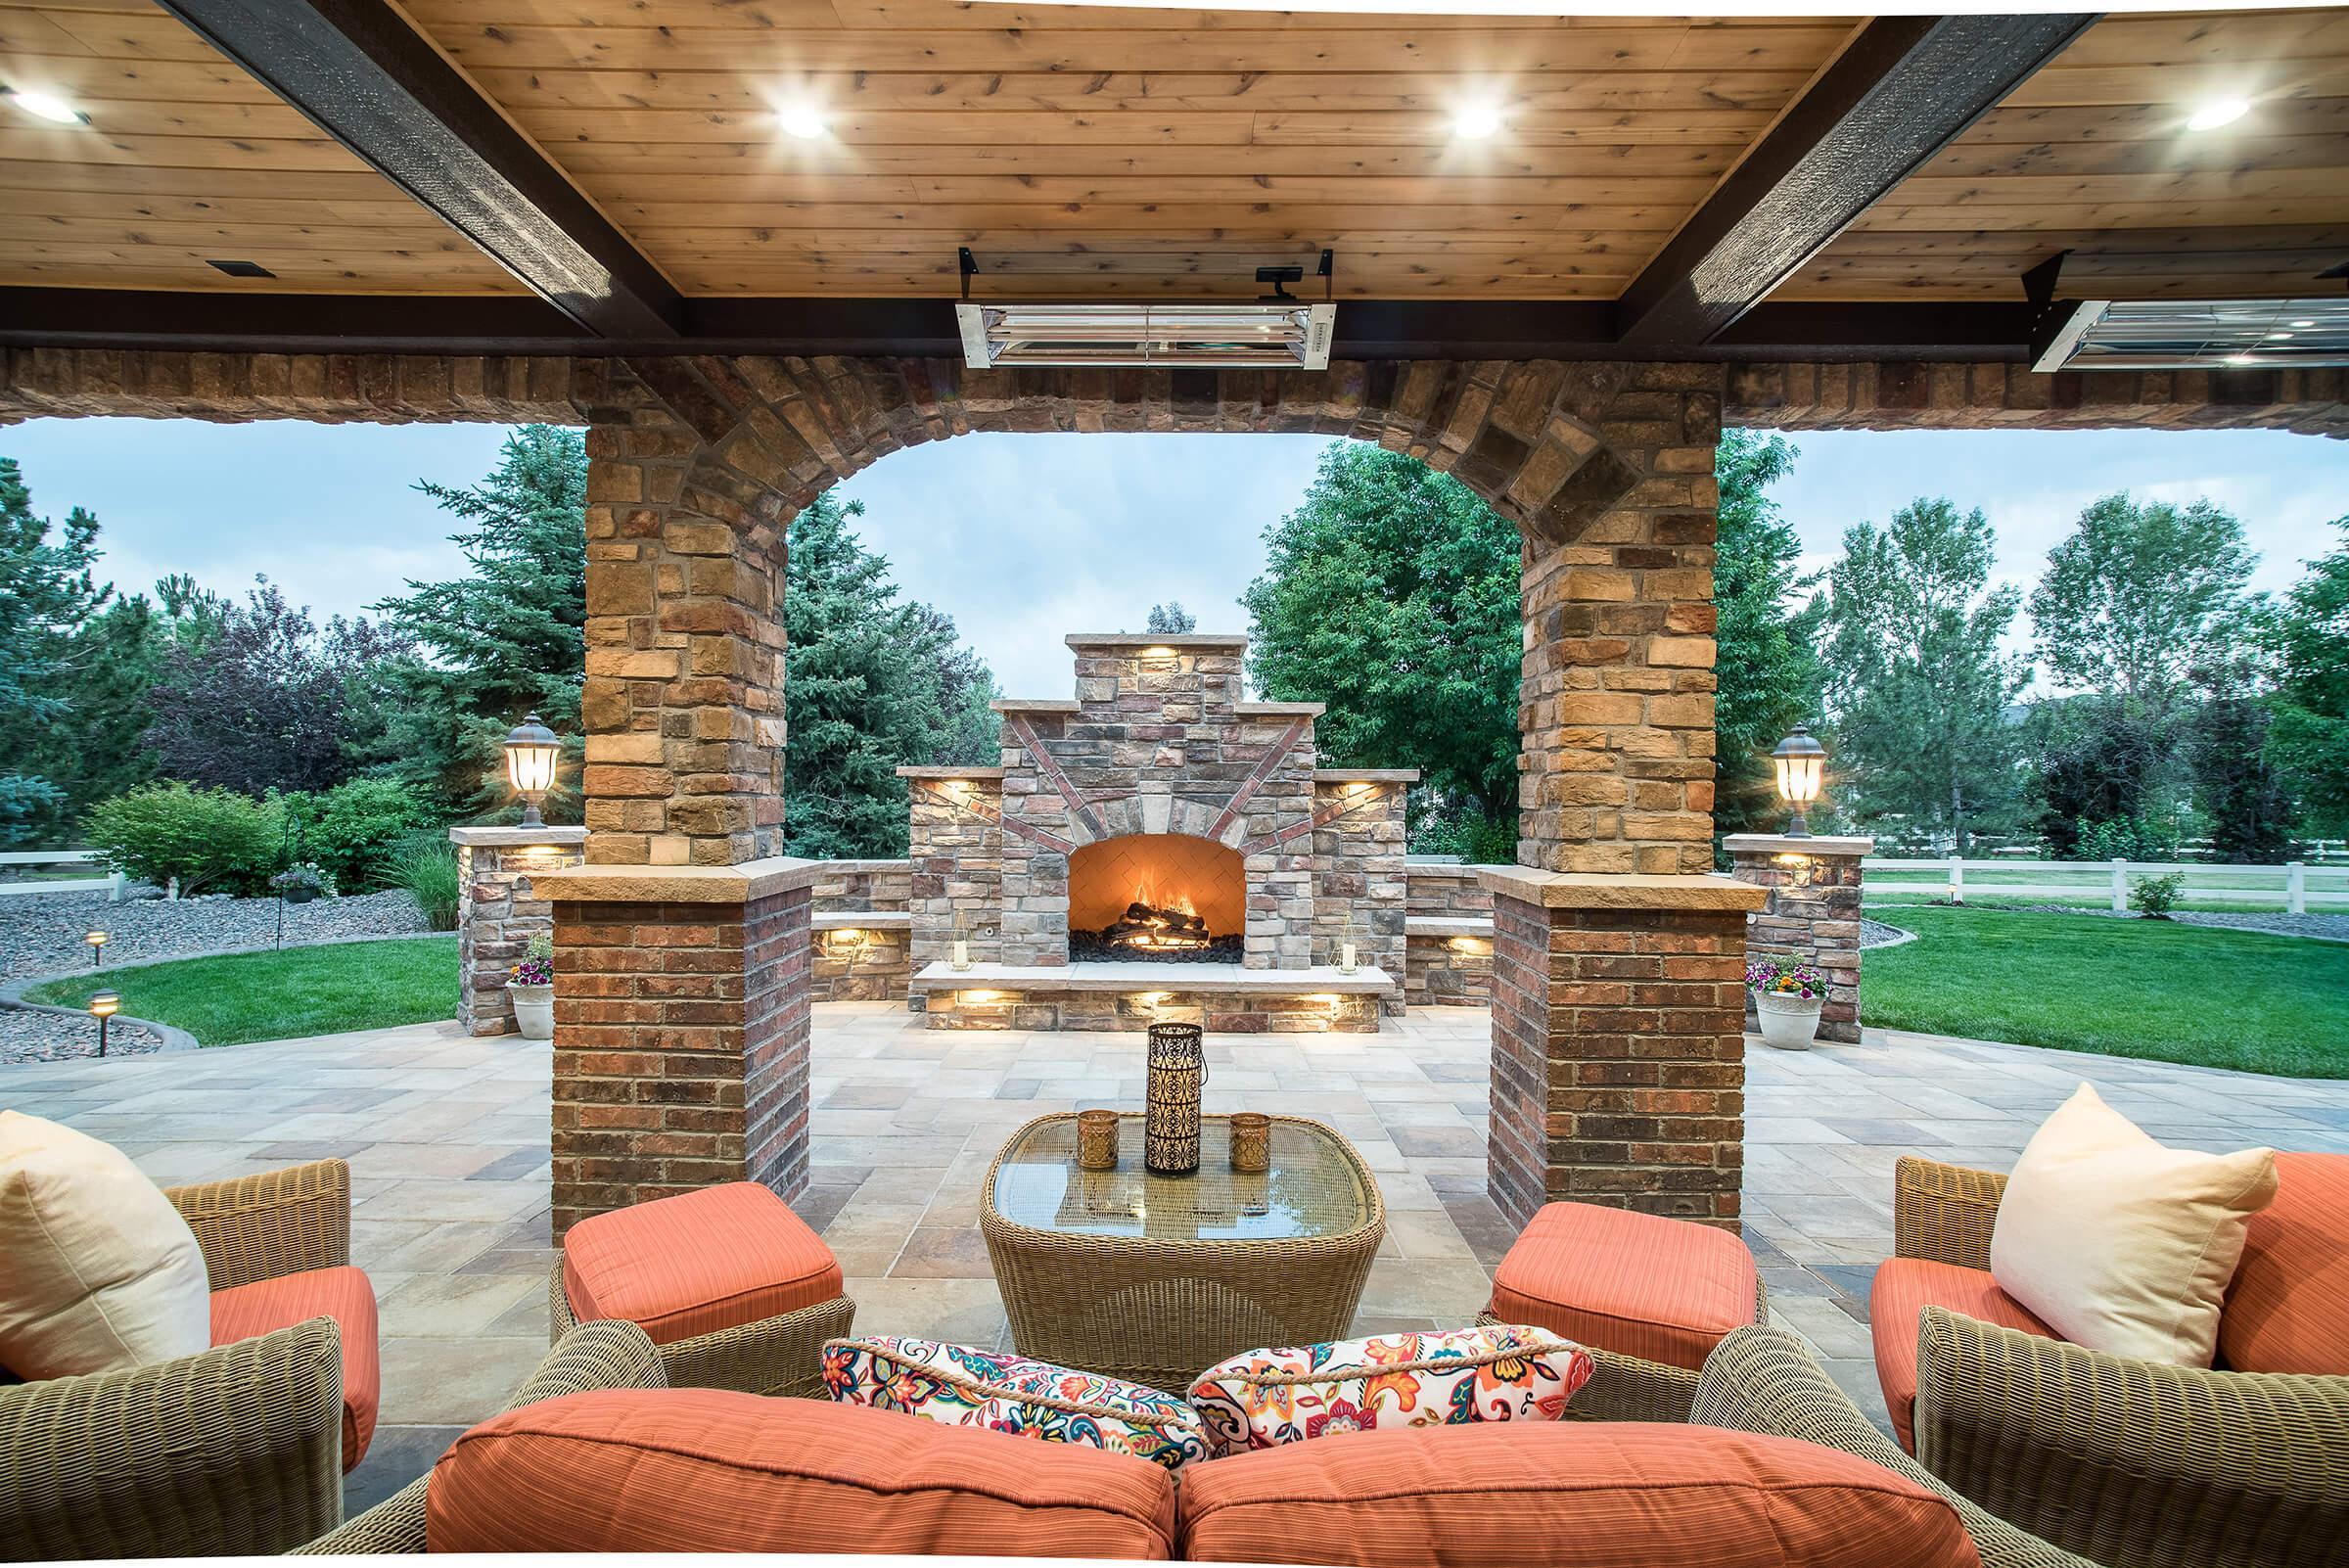 Elite Landscape & Outdoor Living - Denver, Colorado ... on Elite Landscape And Outdoor Living id=63092